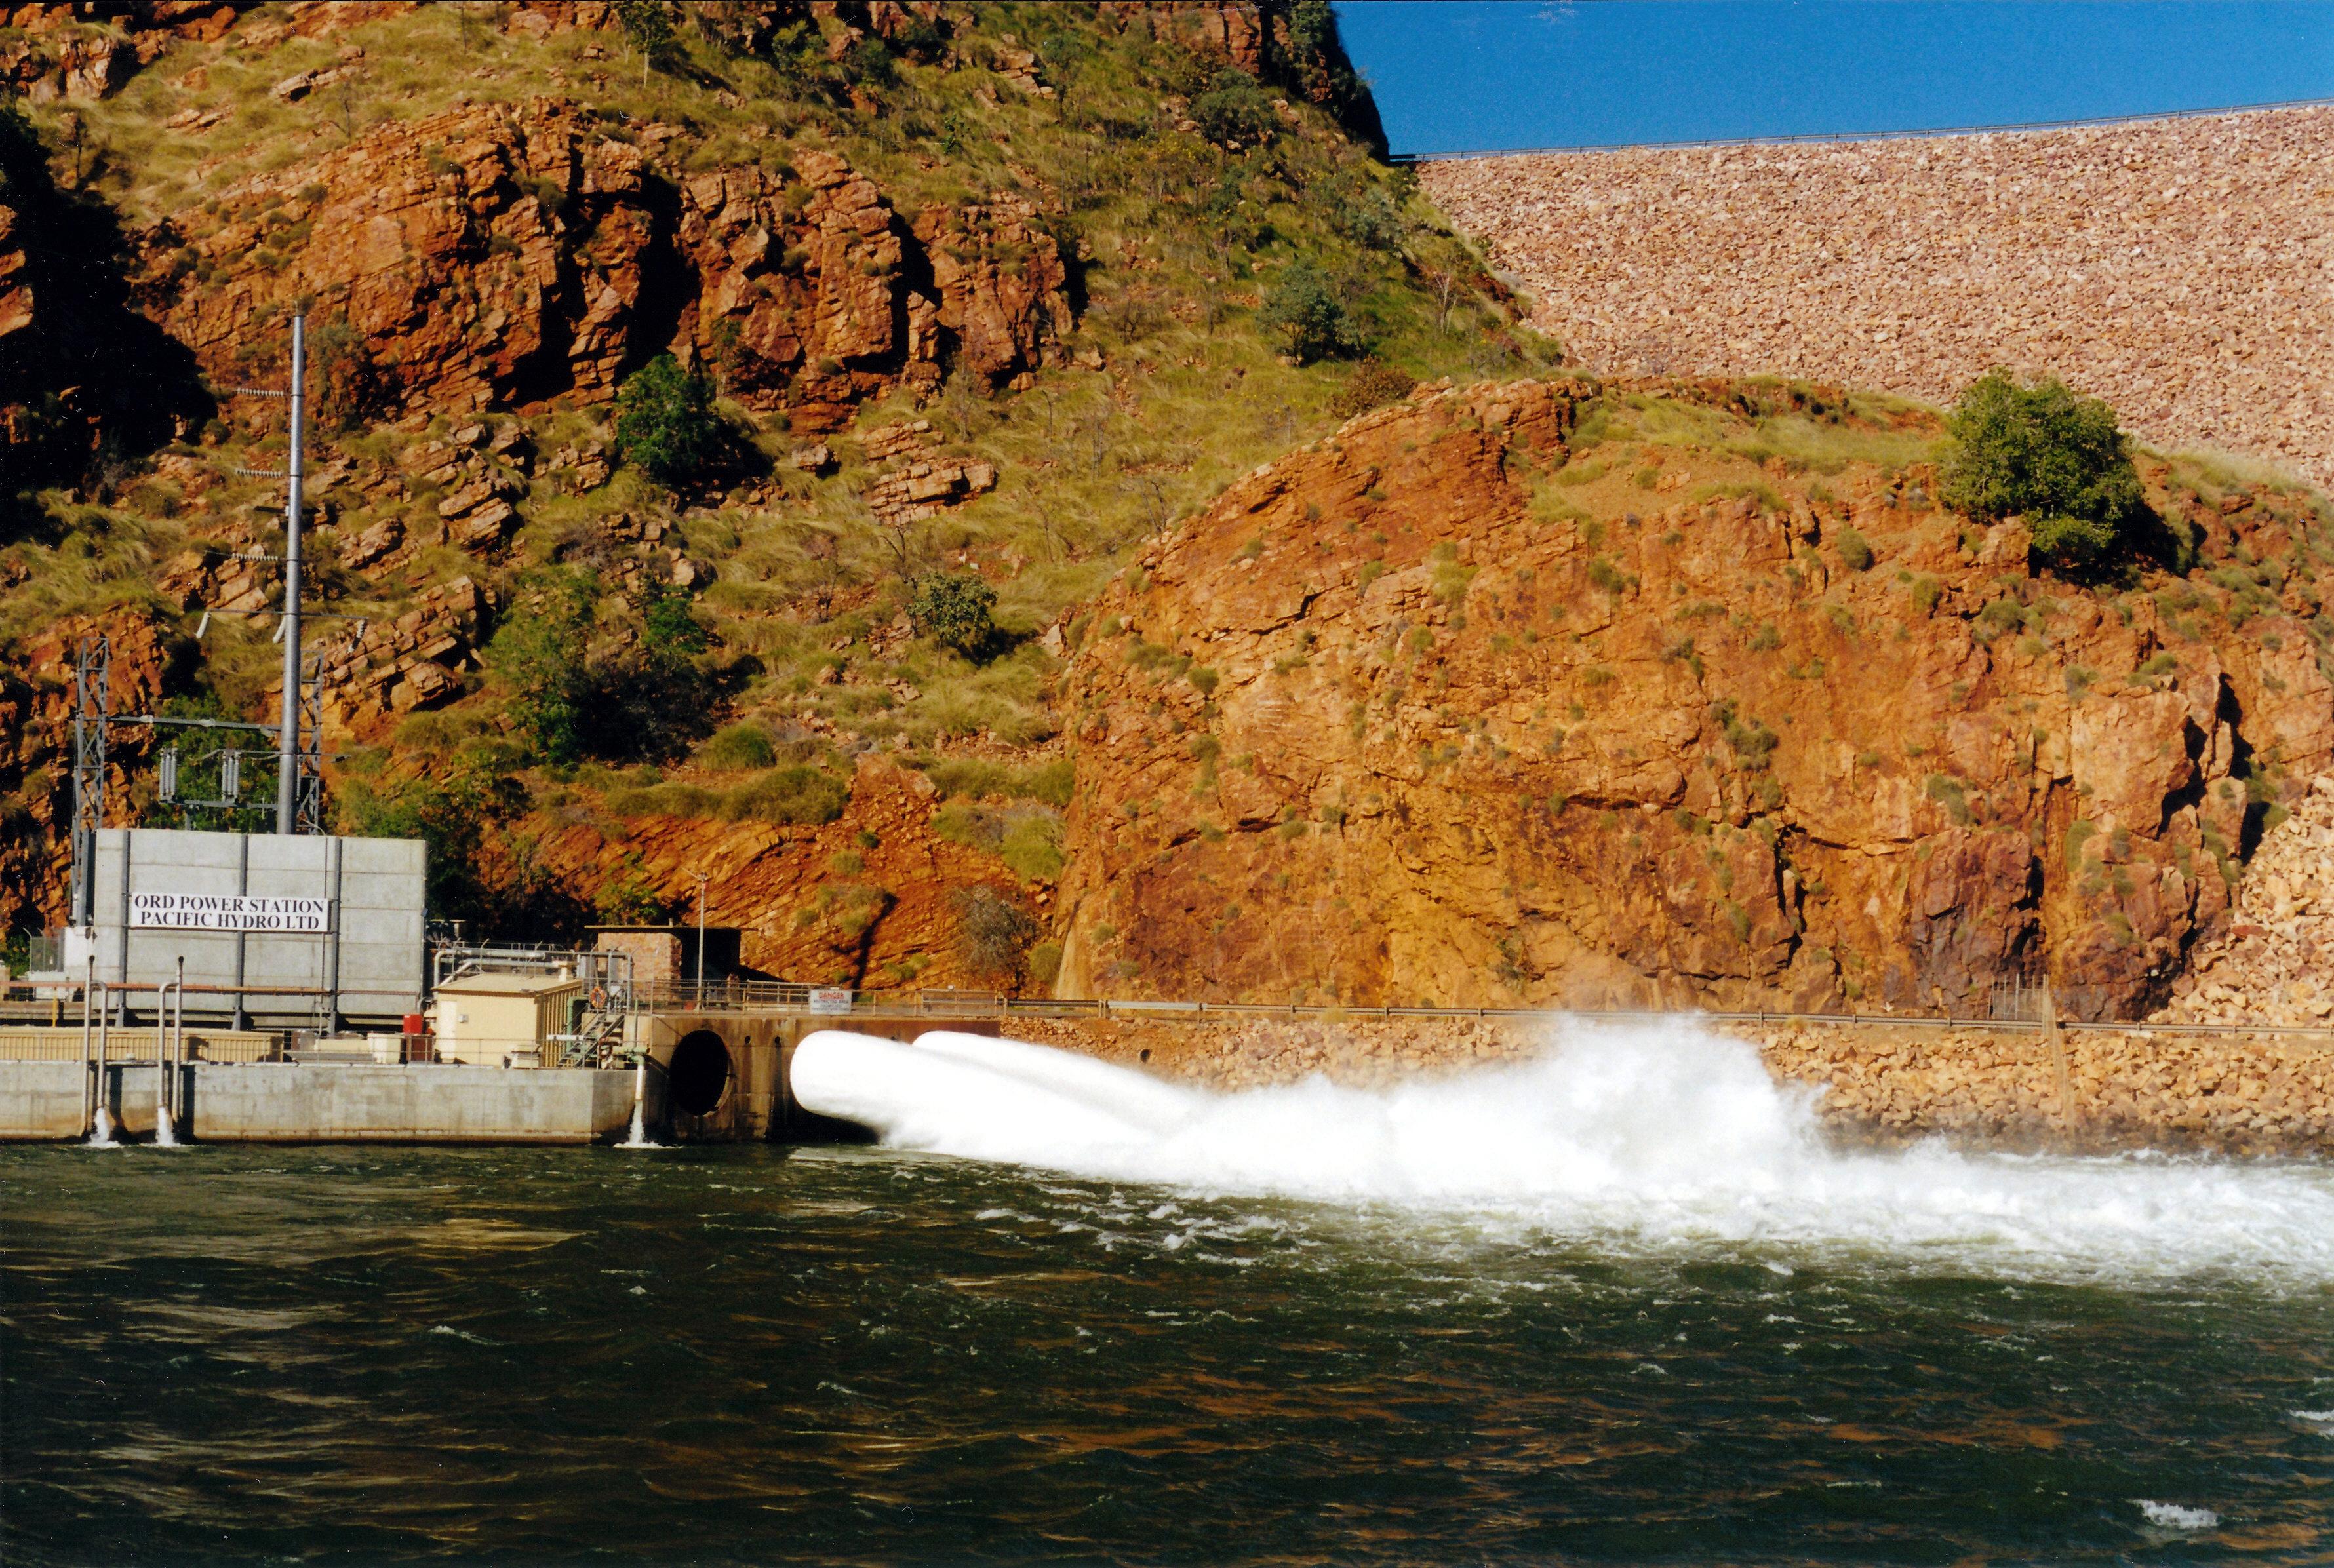 06-27-2000 04 Lake Argyle hydro plant.jpg